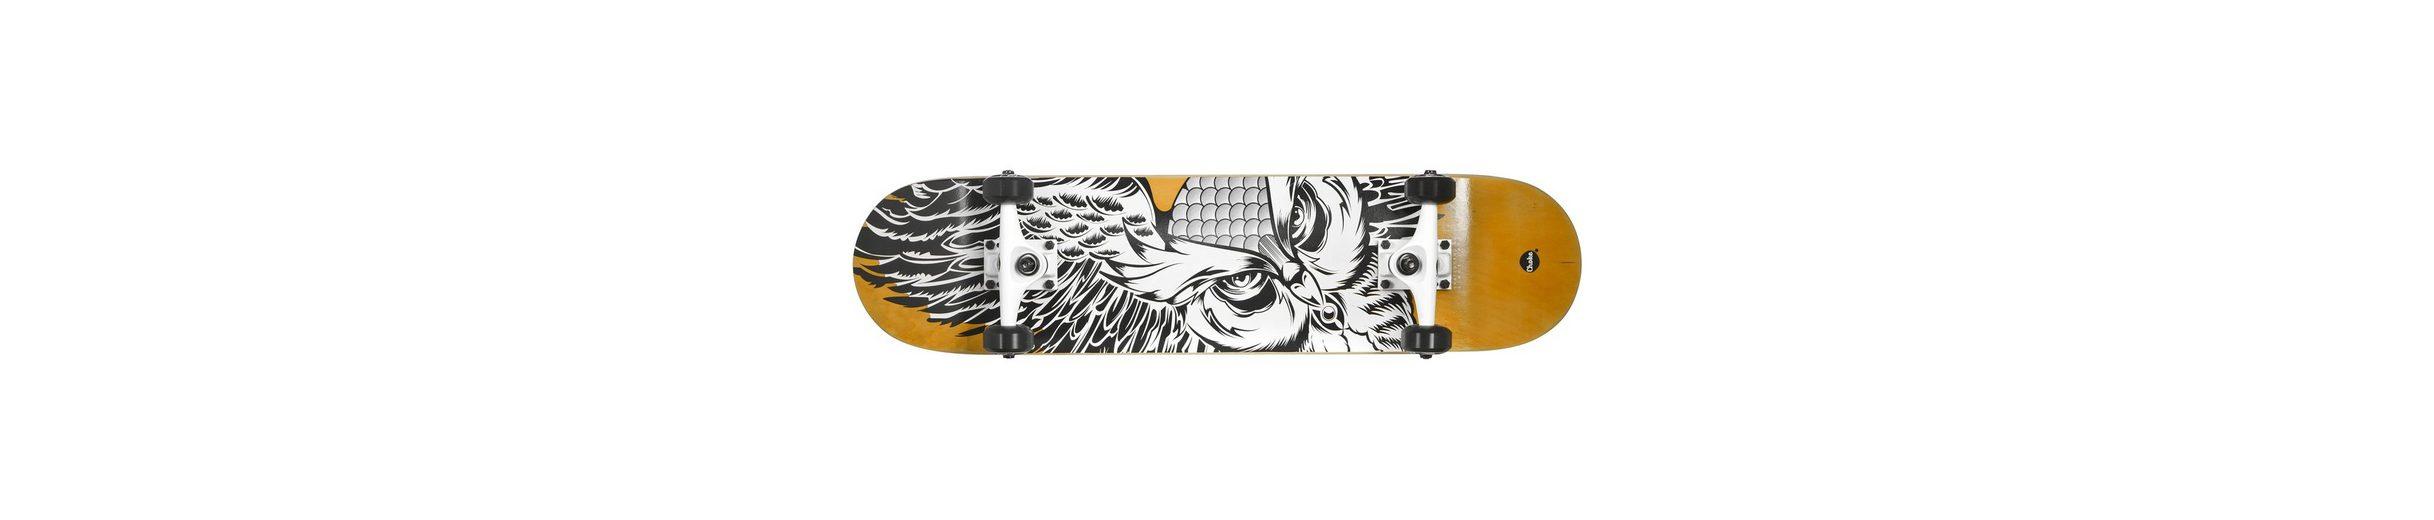 Choke Skateboard, »Nightwing«